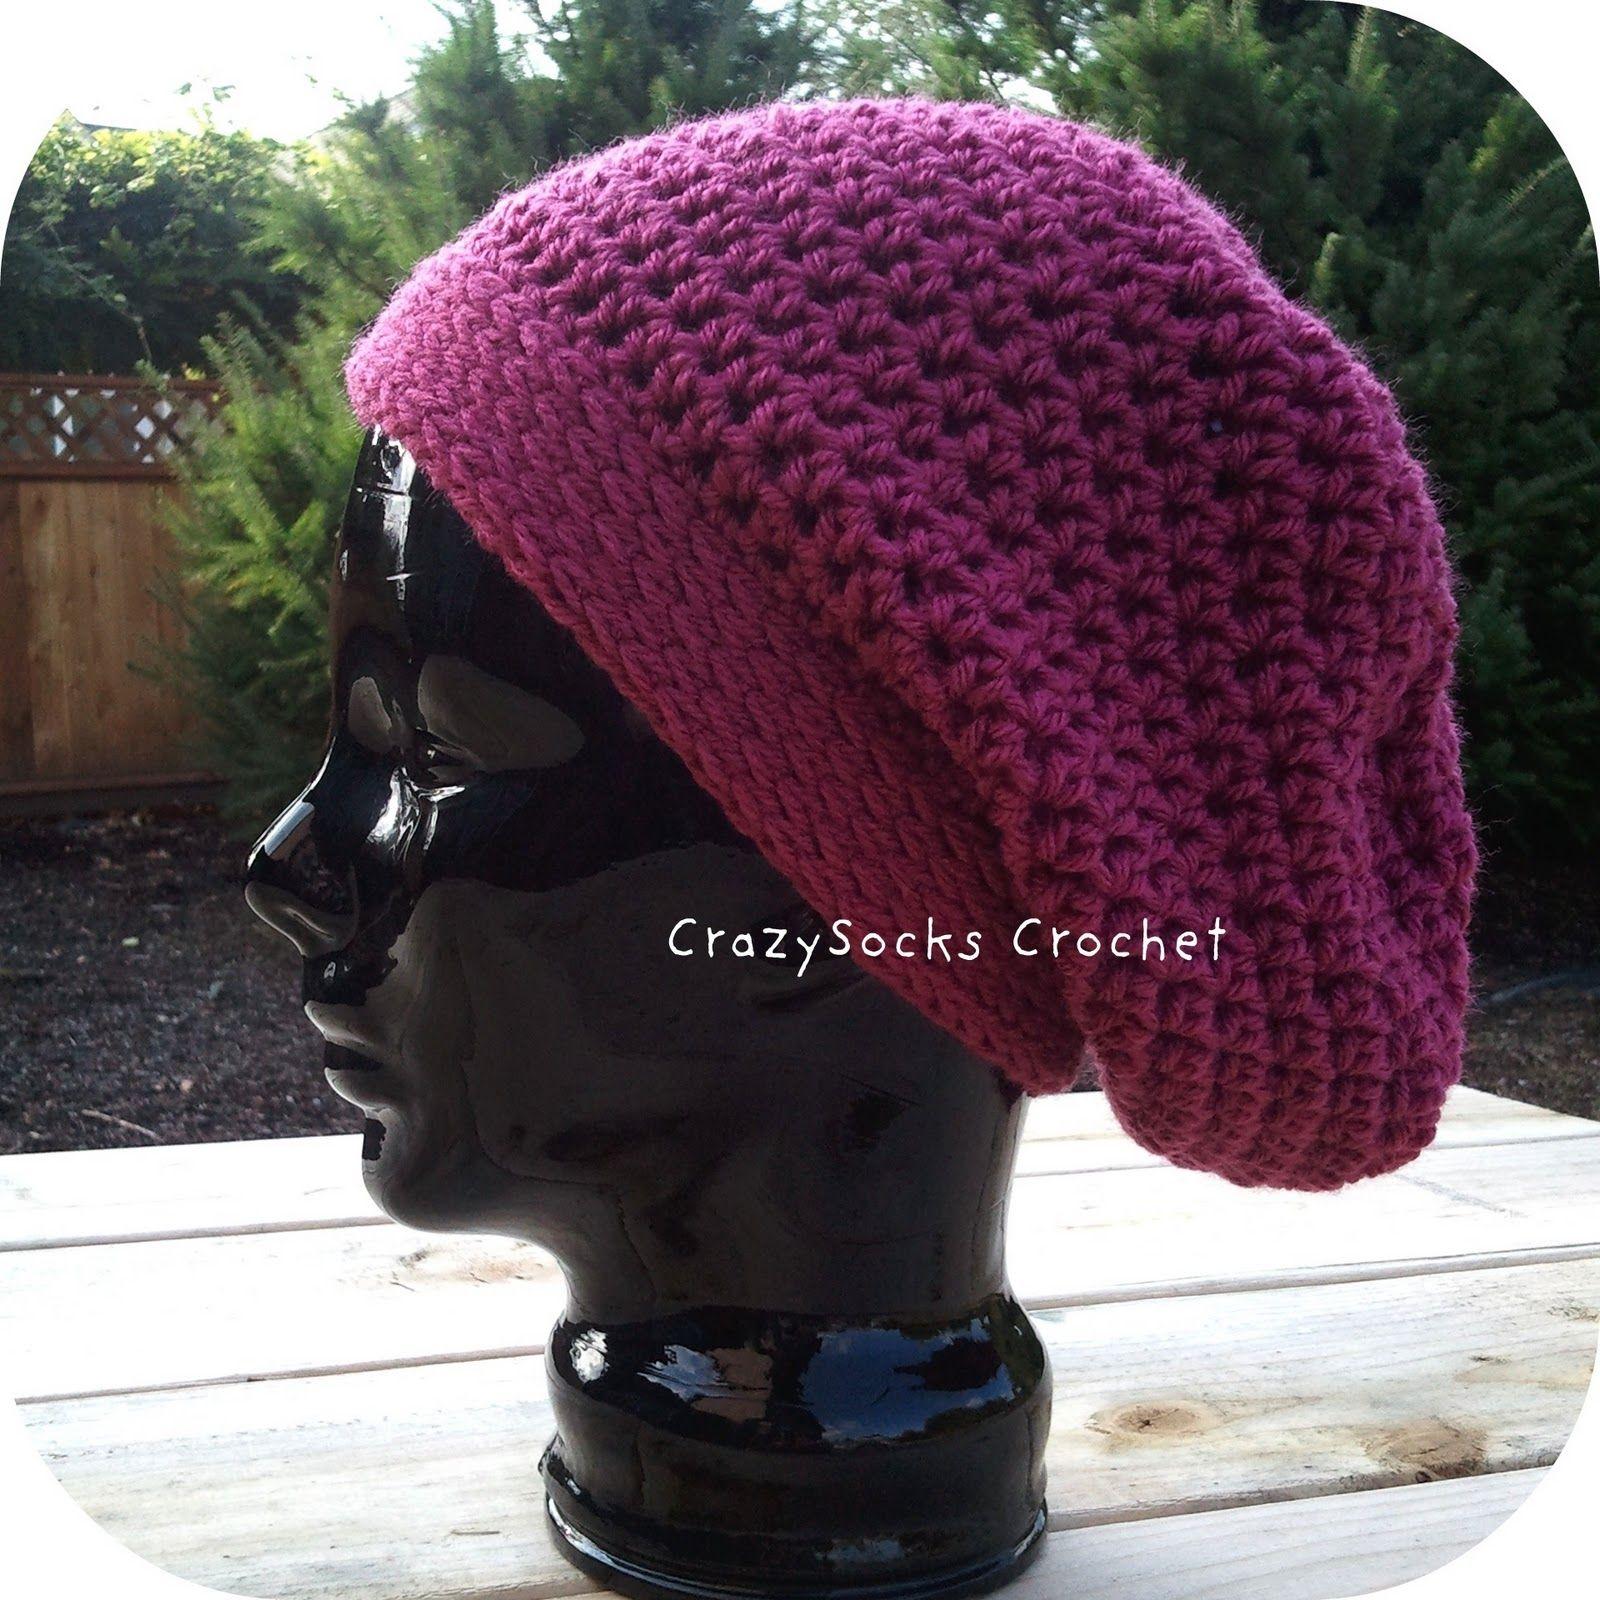 CrazySocks Crochet: CROCHET PATTERN - Super Slouch Hat